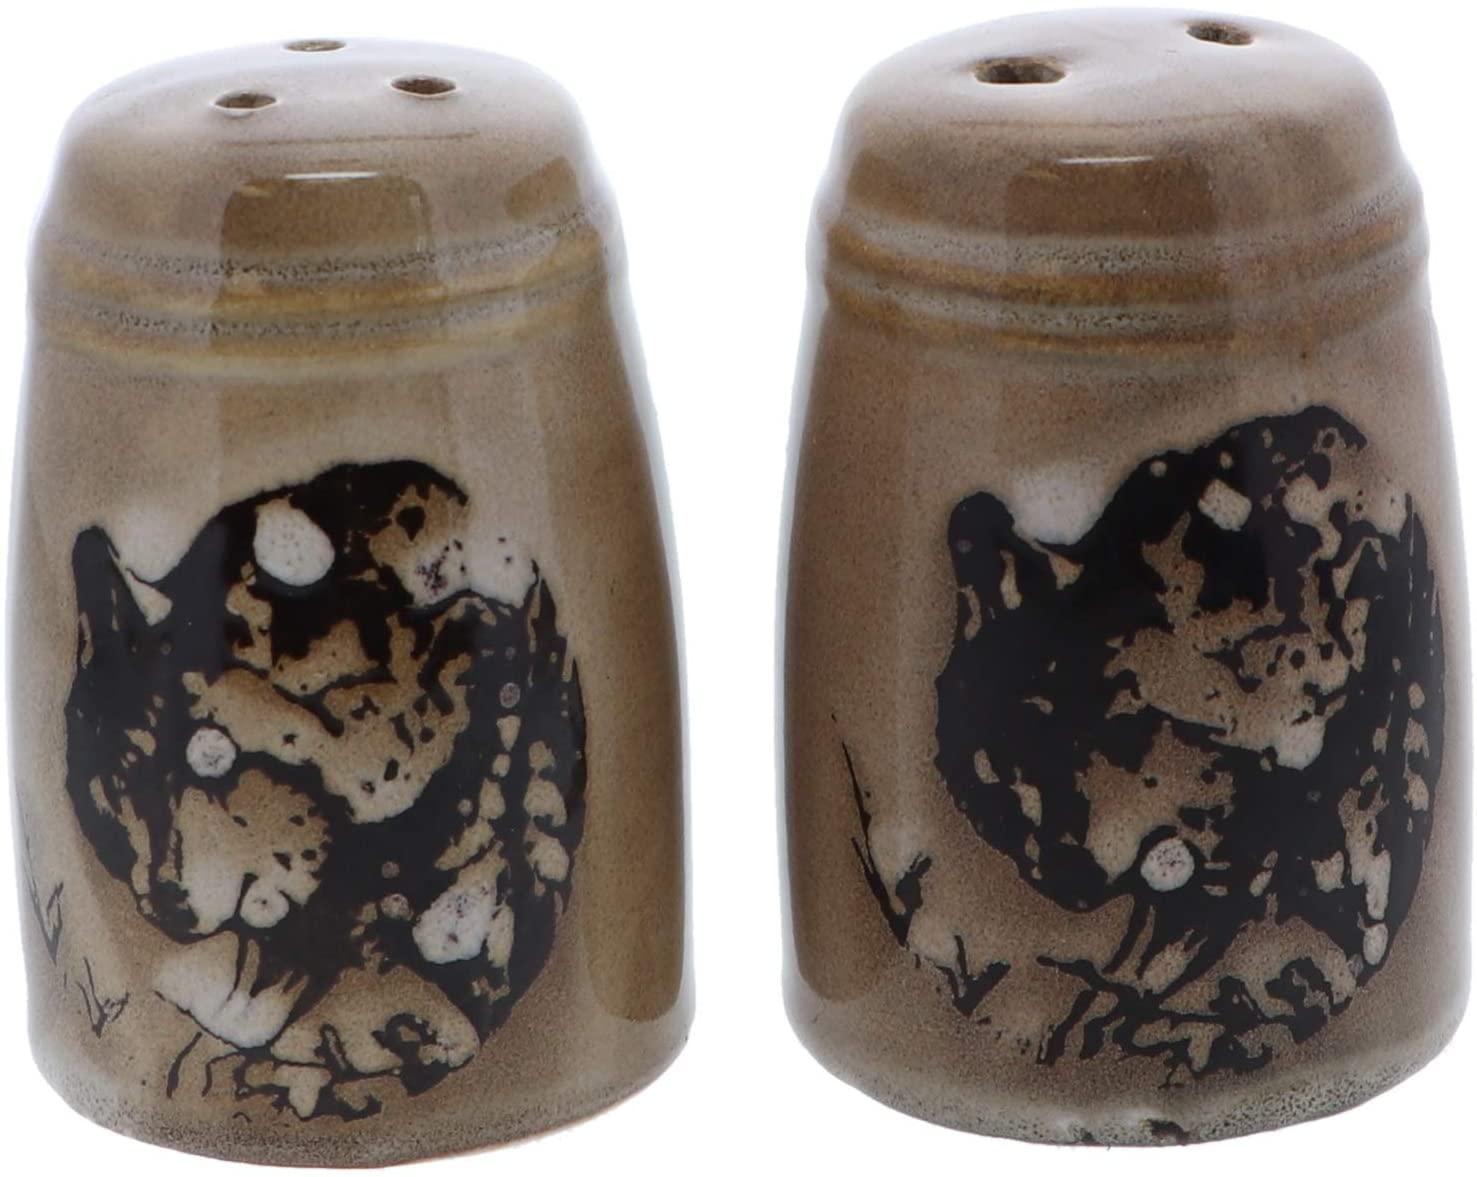 Animal Salt & Pepper Shaker Sets for Men Kitchen Home Décor - Wolf